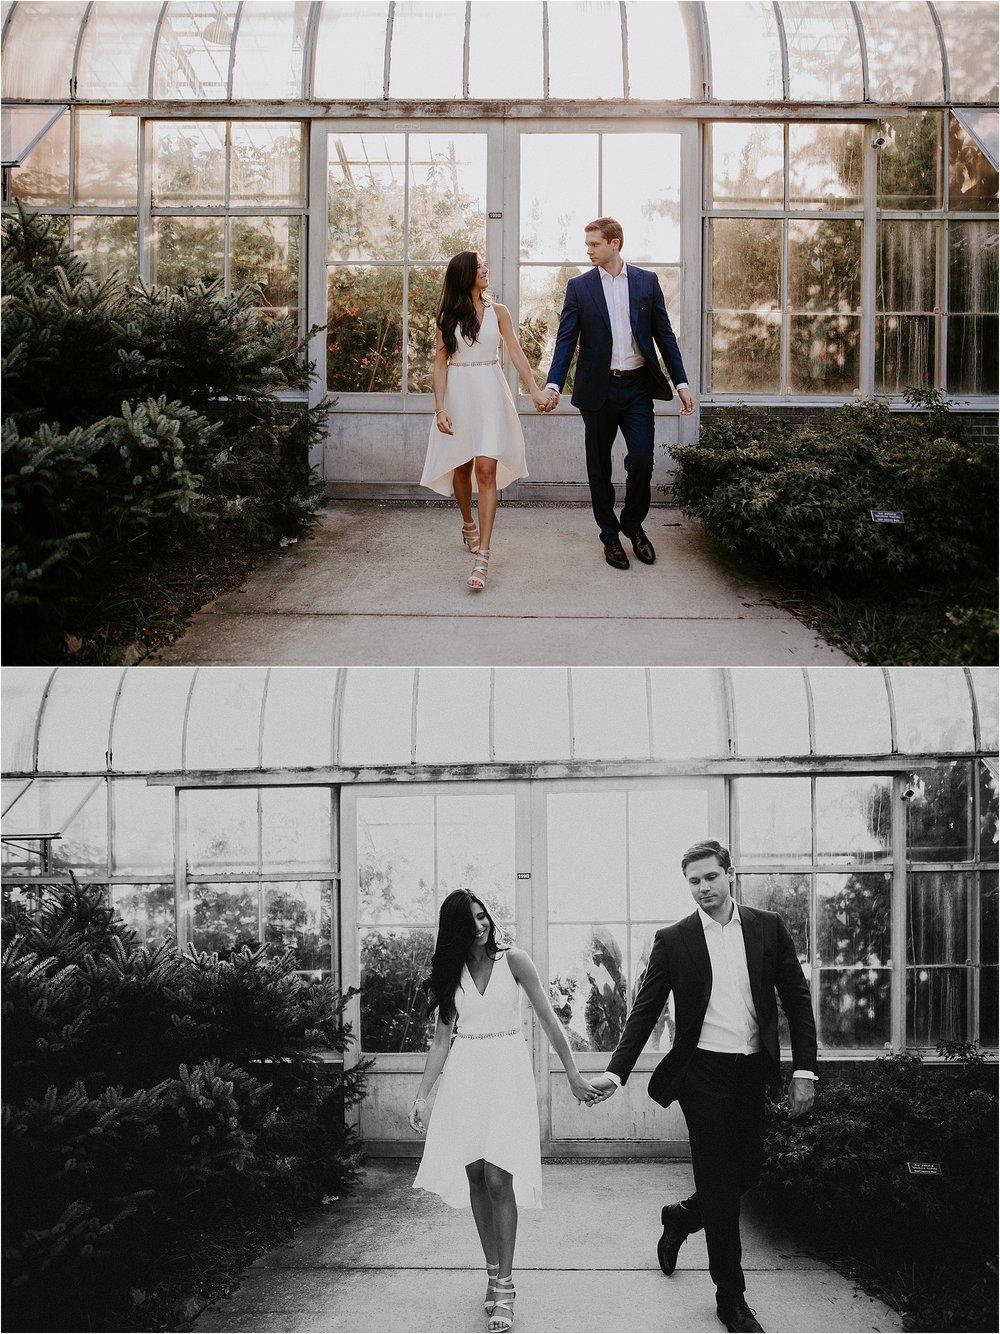 Sarah_Brookhart_Baltimore_Wedding_Photographer_0014.jpg